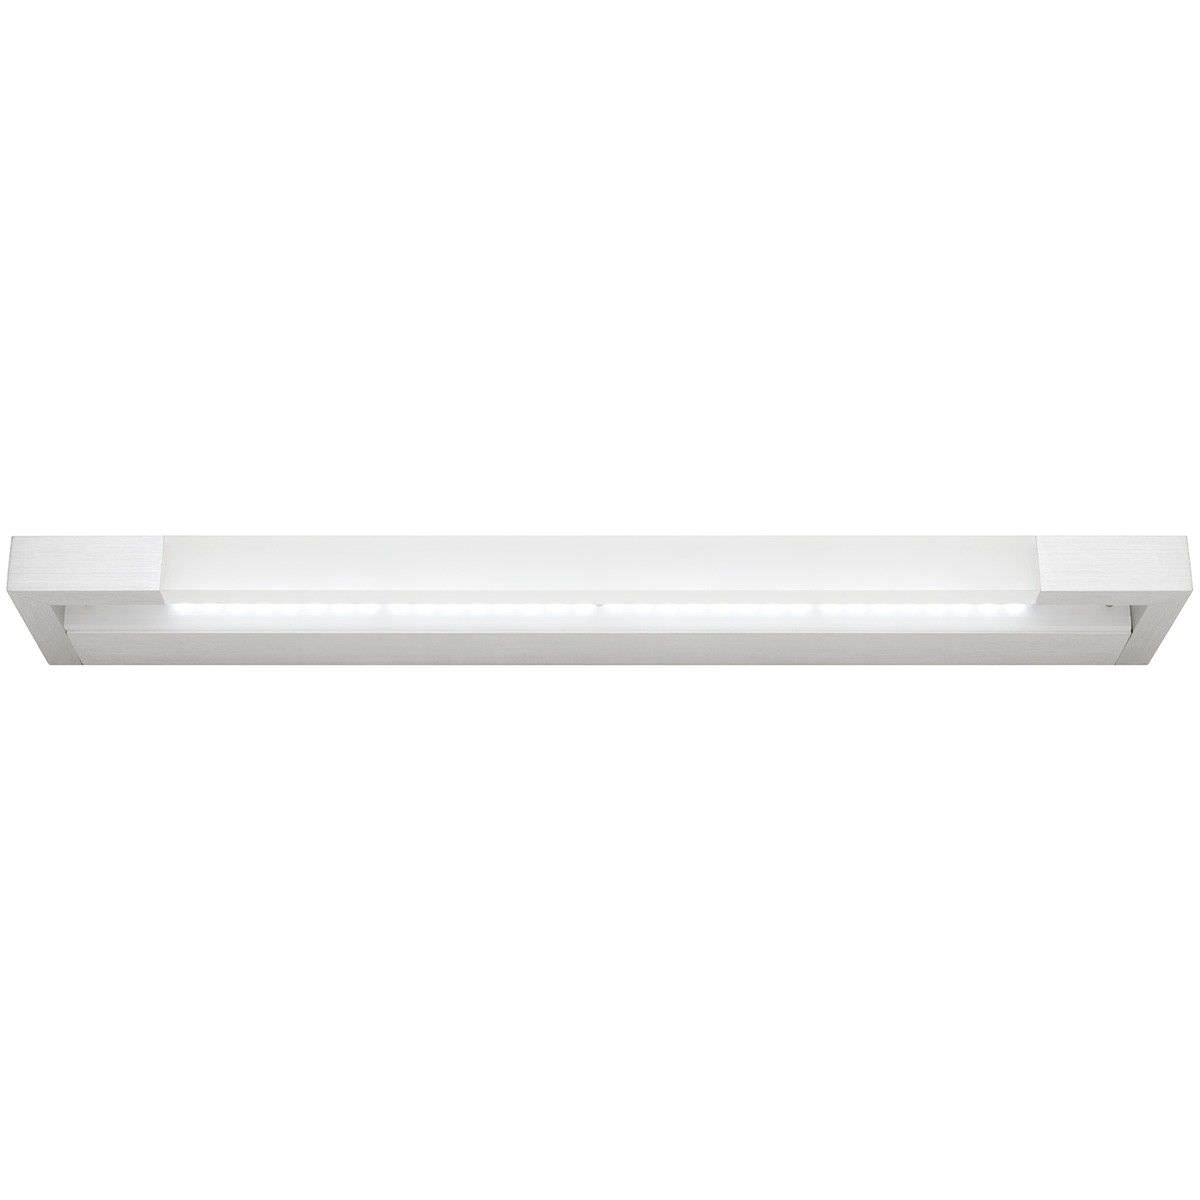 Lynx LED Vanity Light, 16W, Silver